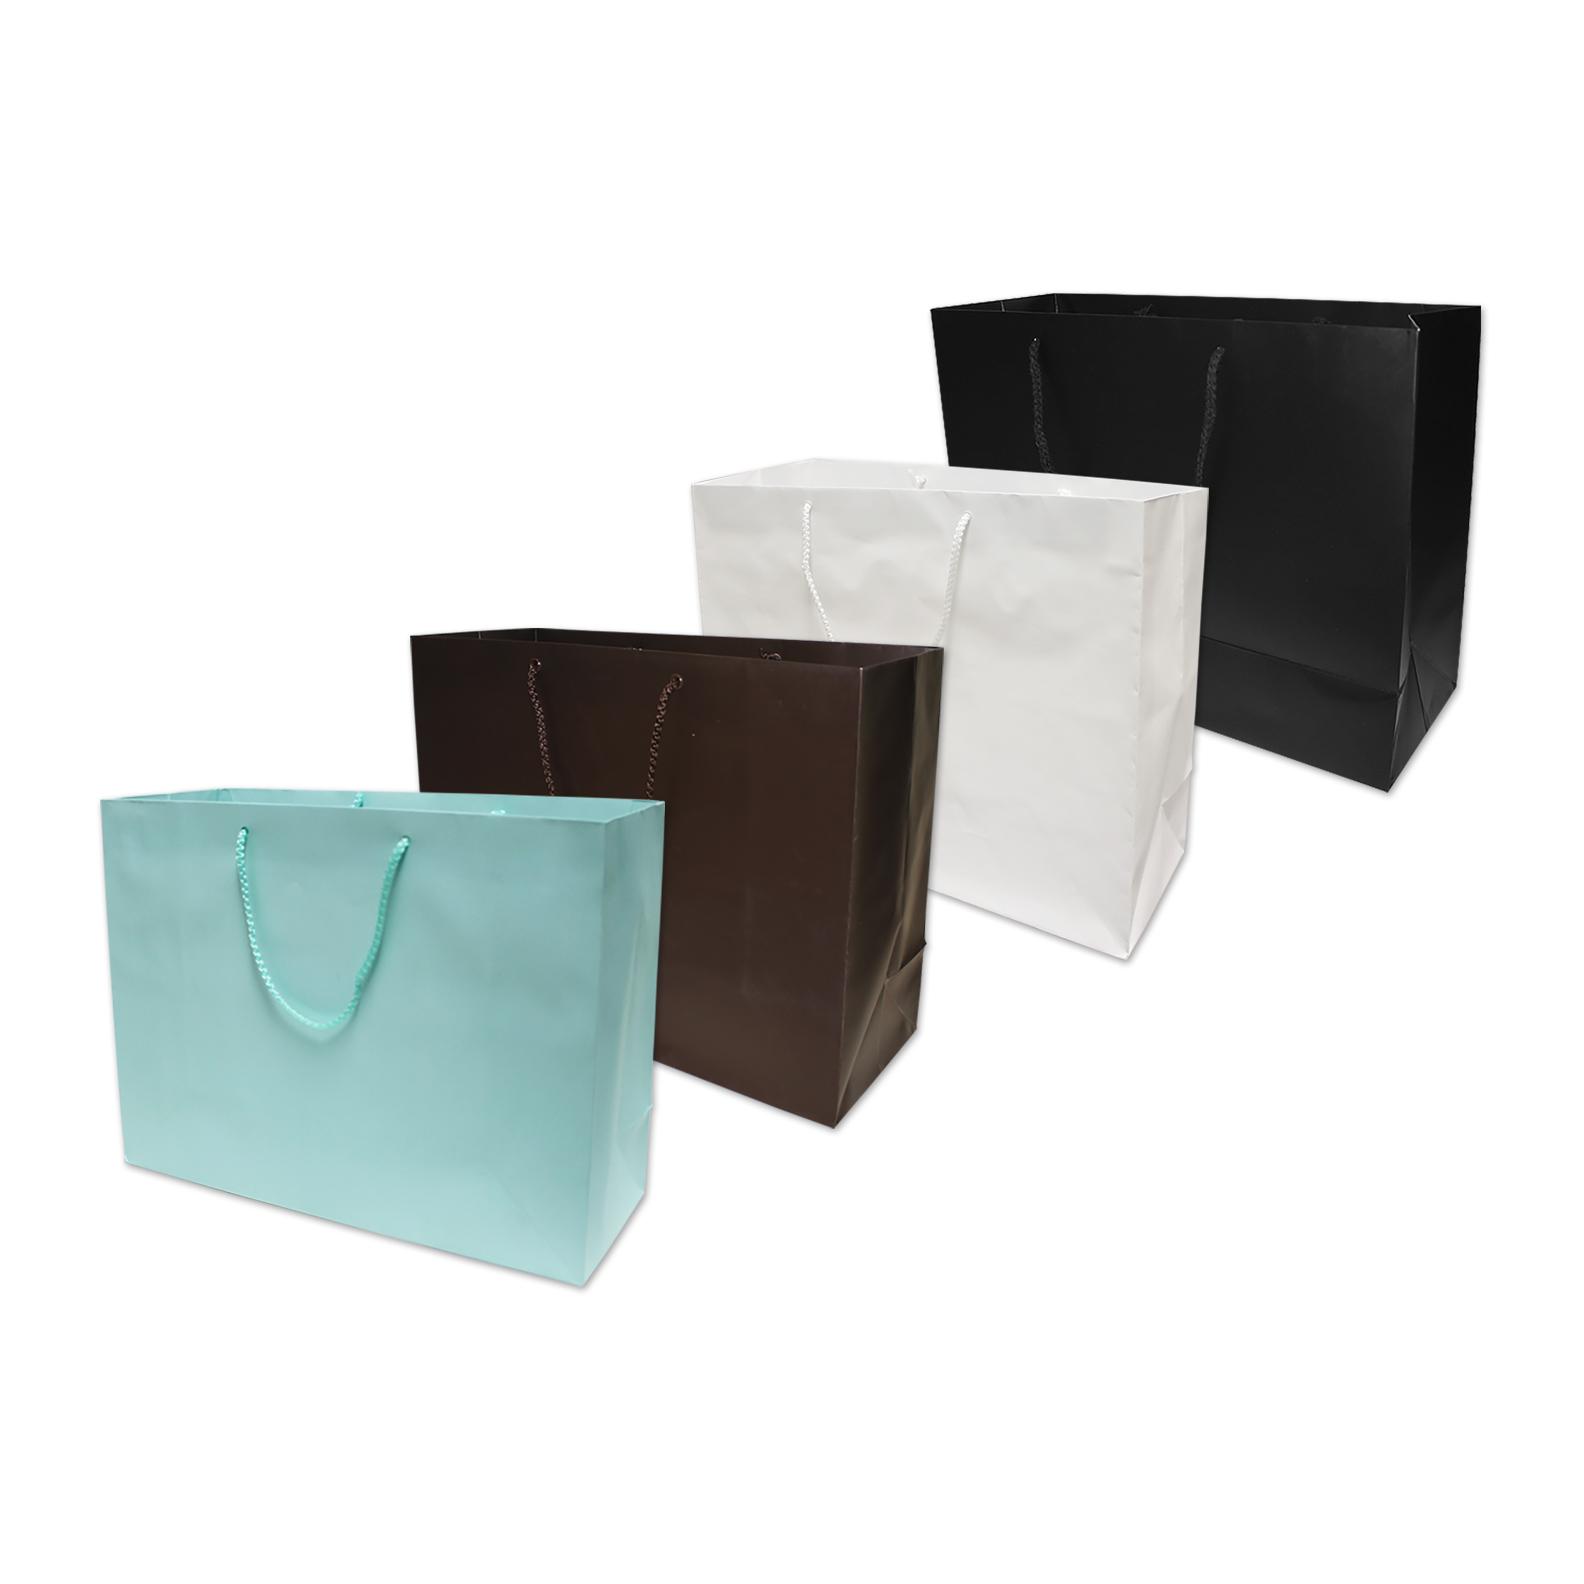 Matte Euro-Tote Vogue Bags